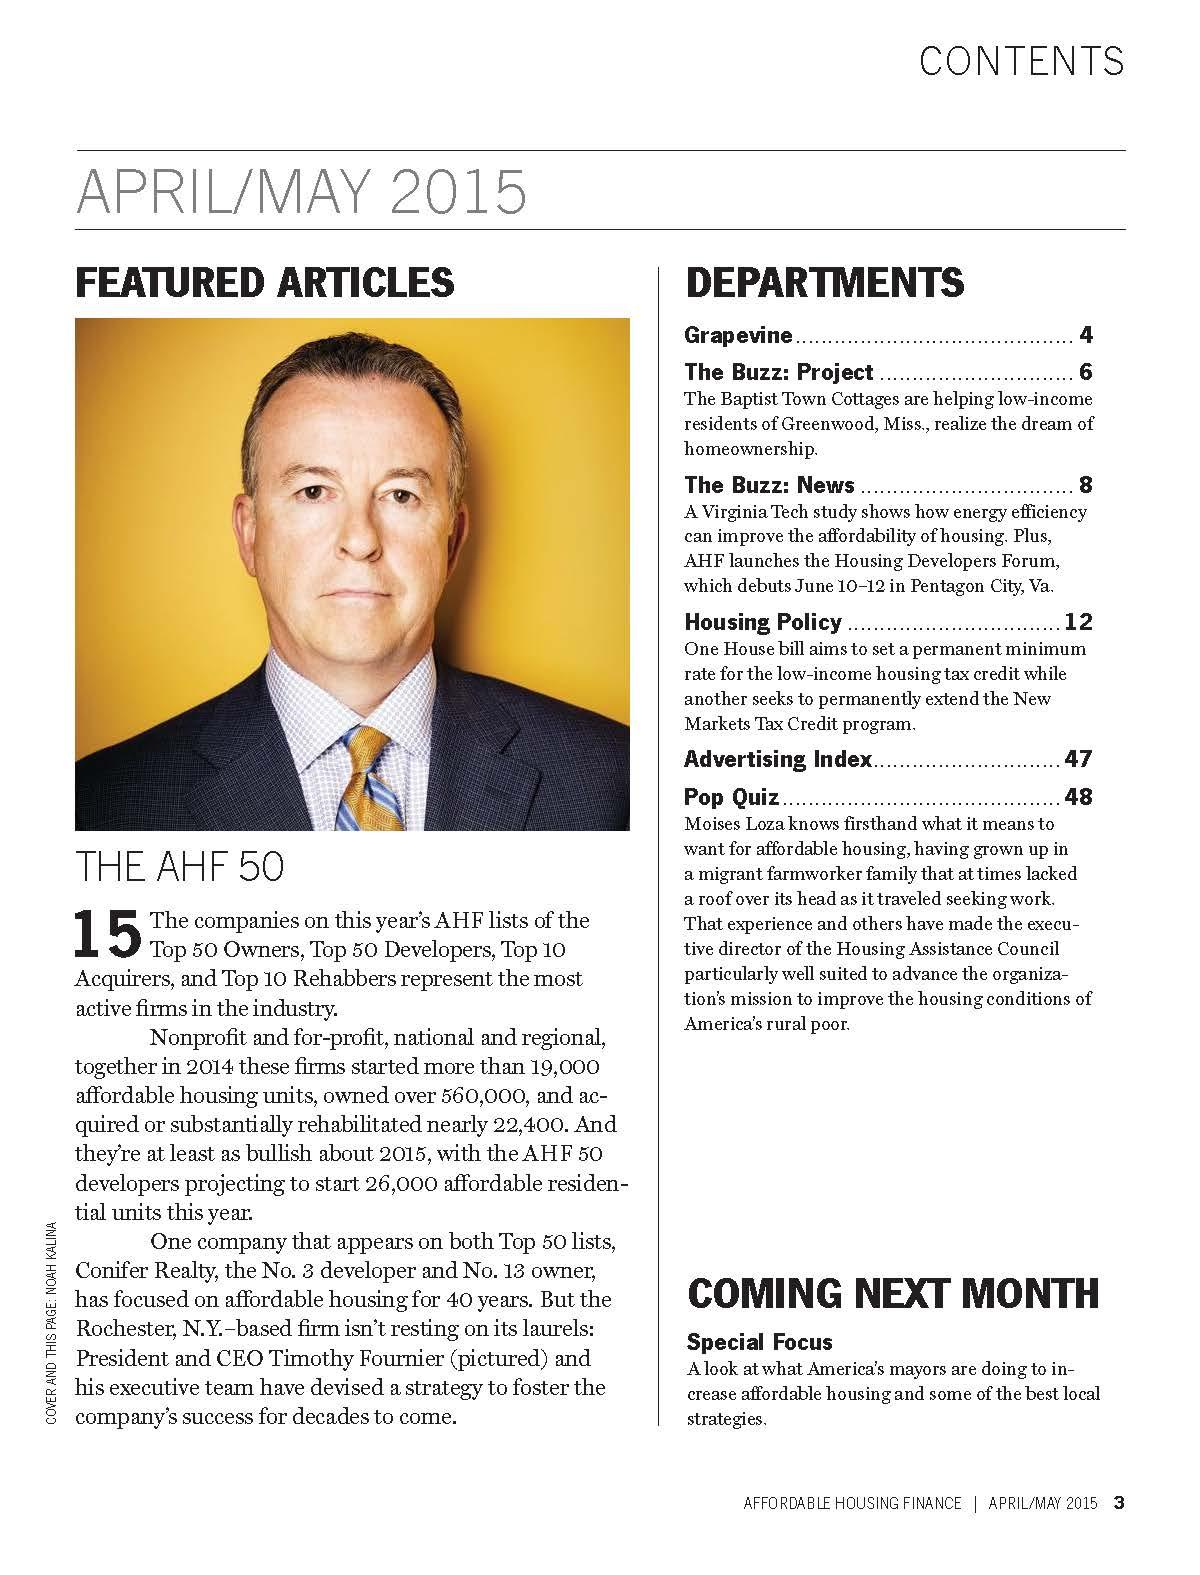 2014 AHF Top 50 Magazine - Madhouse Development